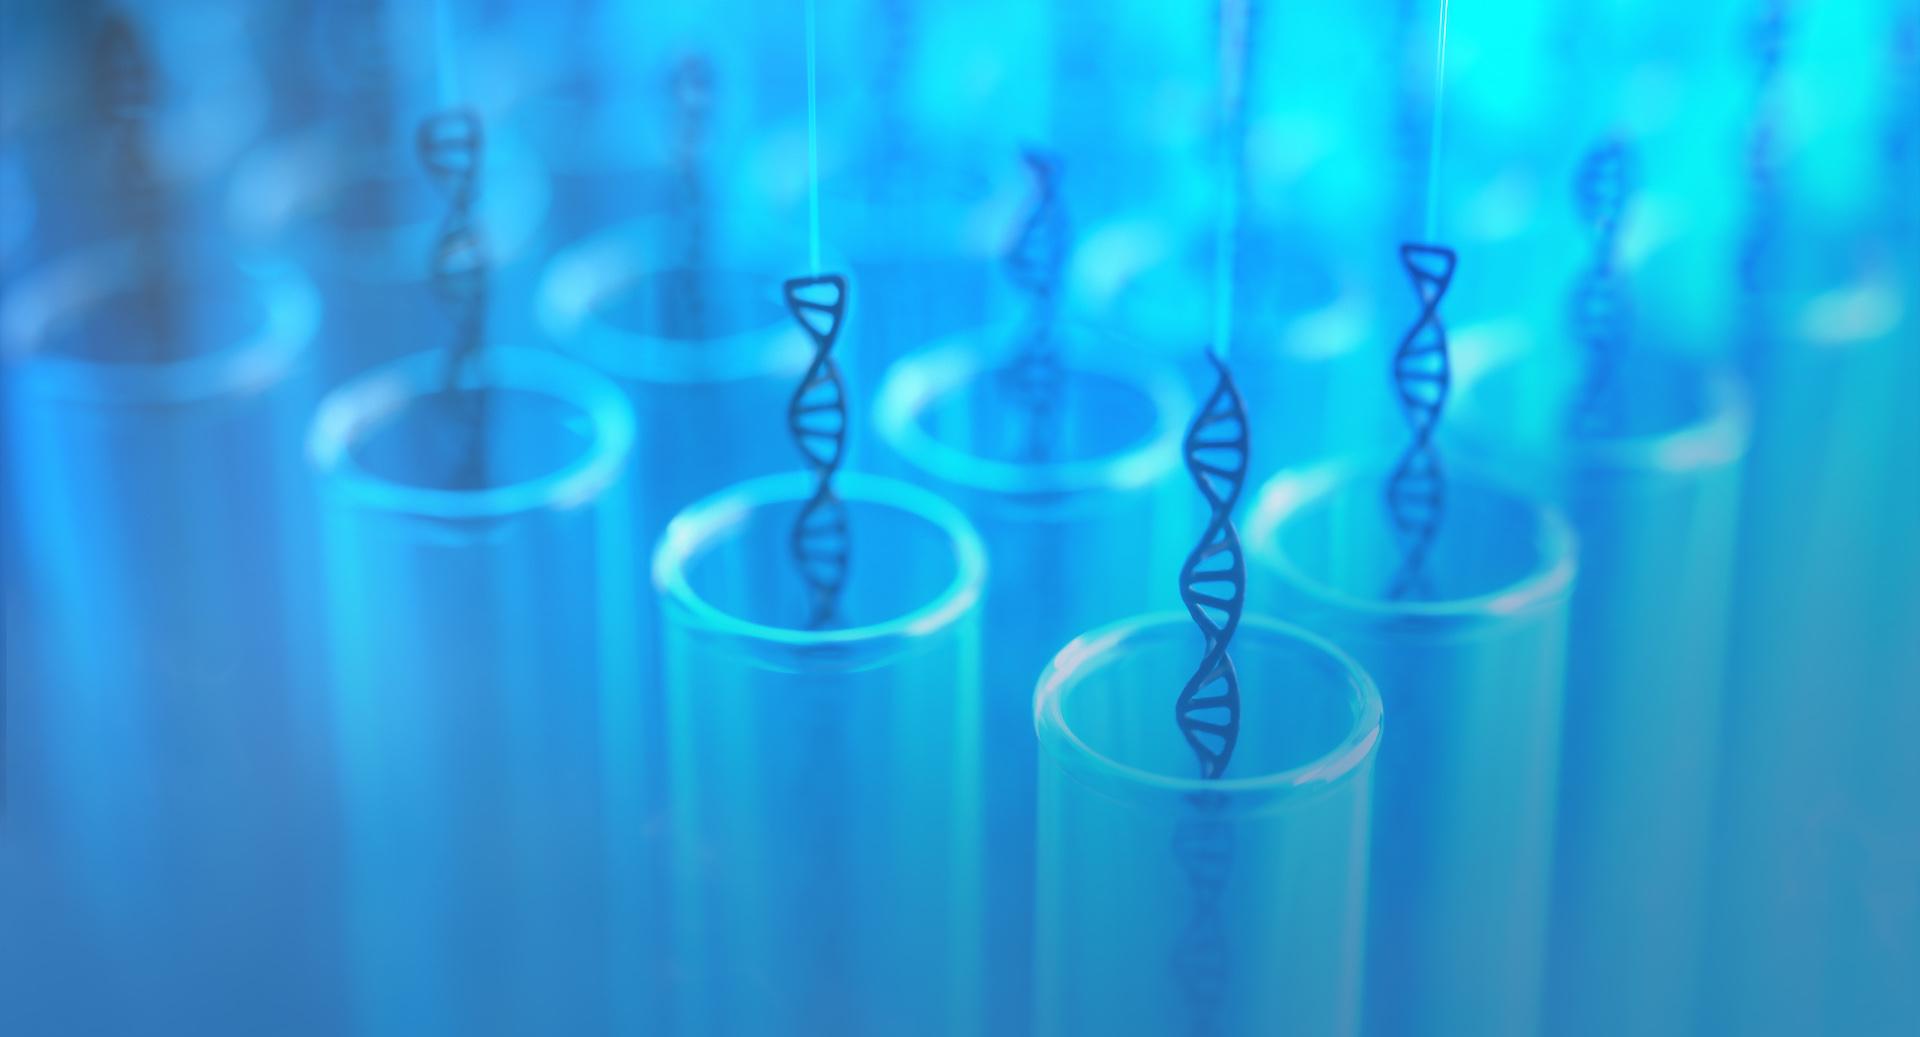 Test Tube DNA Cloning